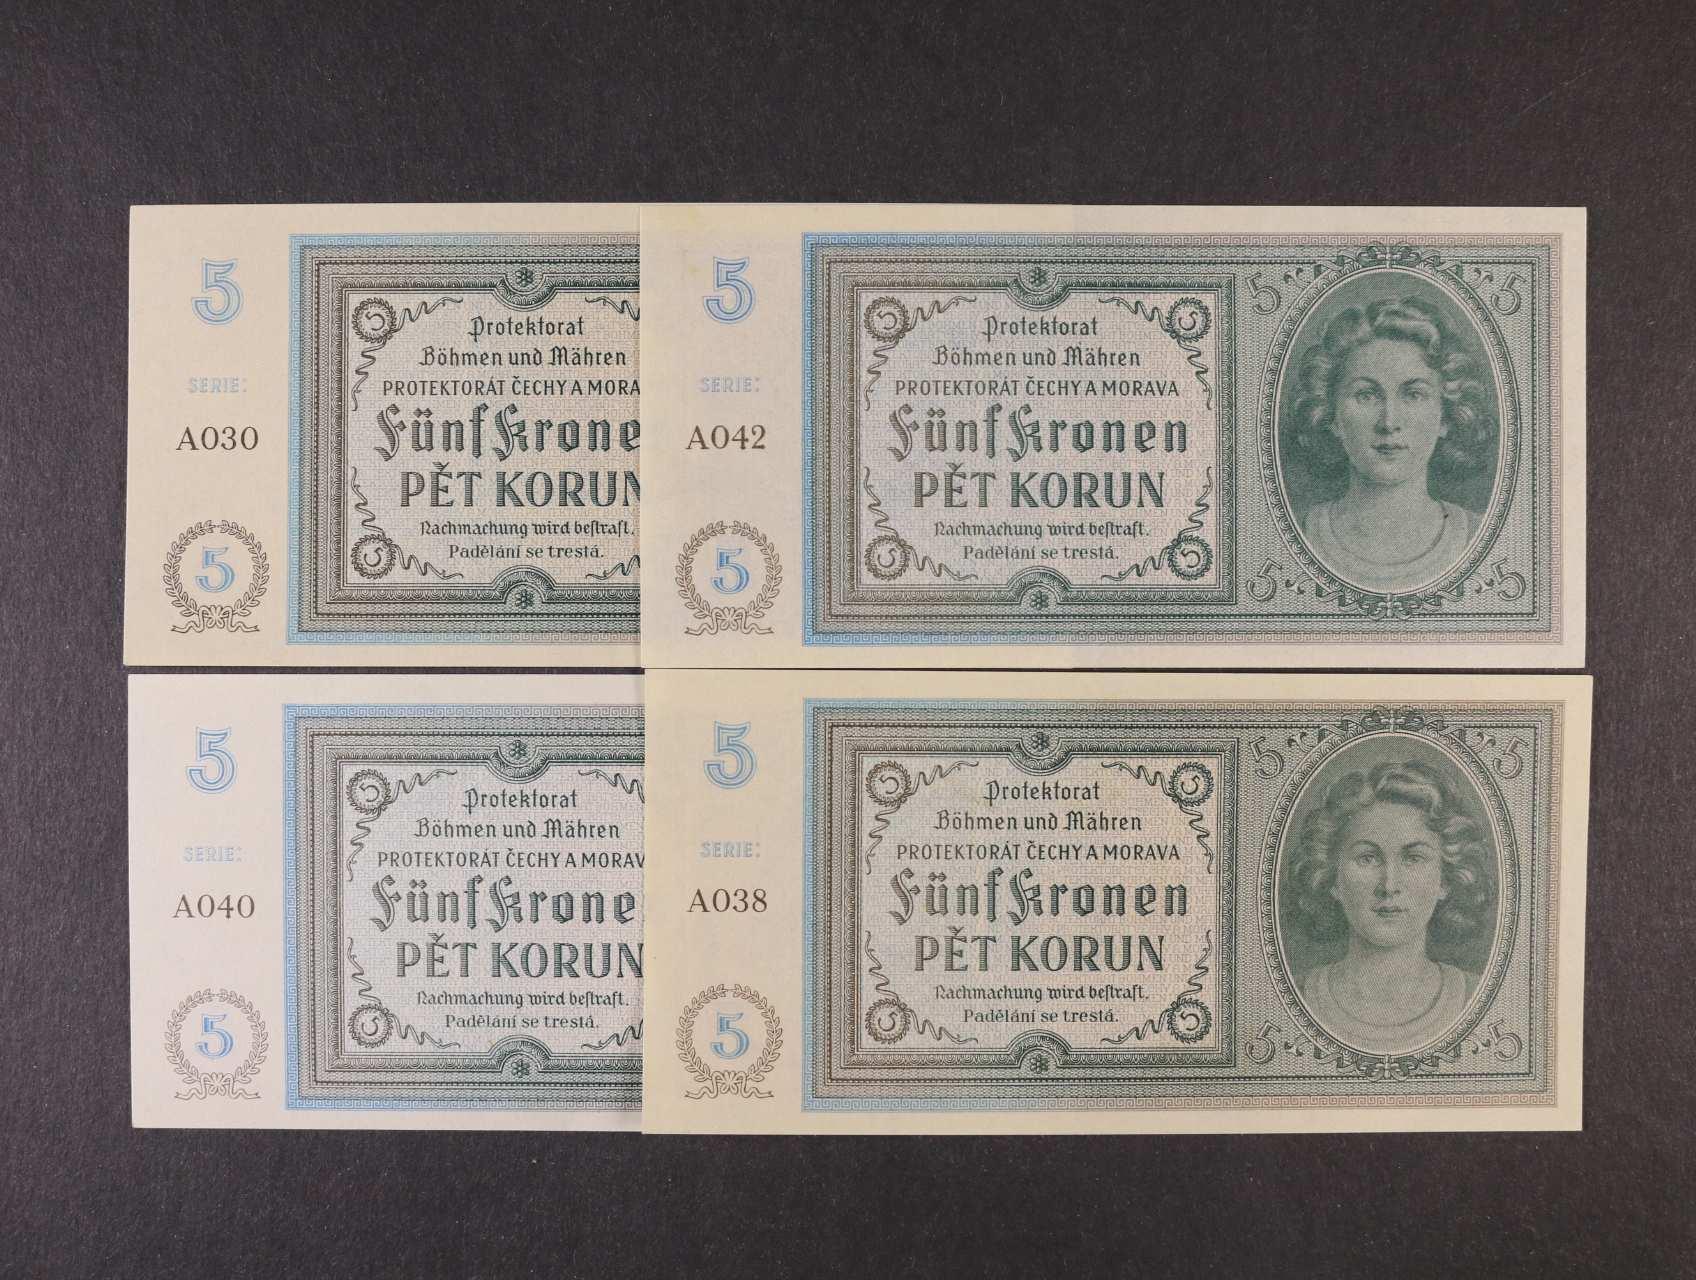 5 K 1940 série A 030, 038, 040, 042, Ba. 31, Pi. 4a, 4ks